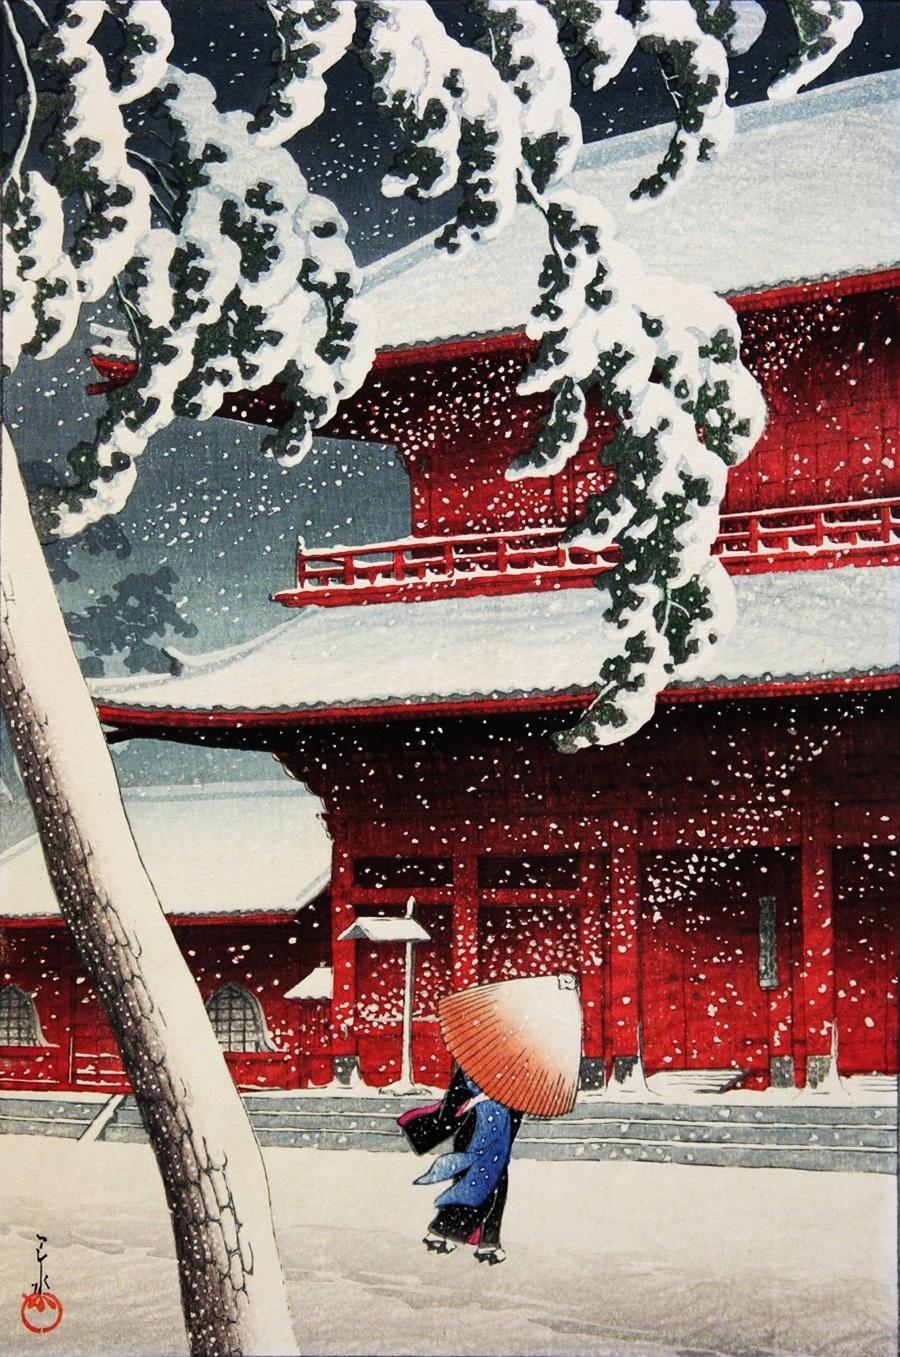 川瀬巴水 明治の浮世絵師 Hasui_Kawase